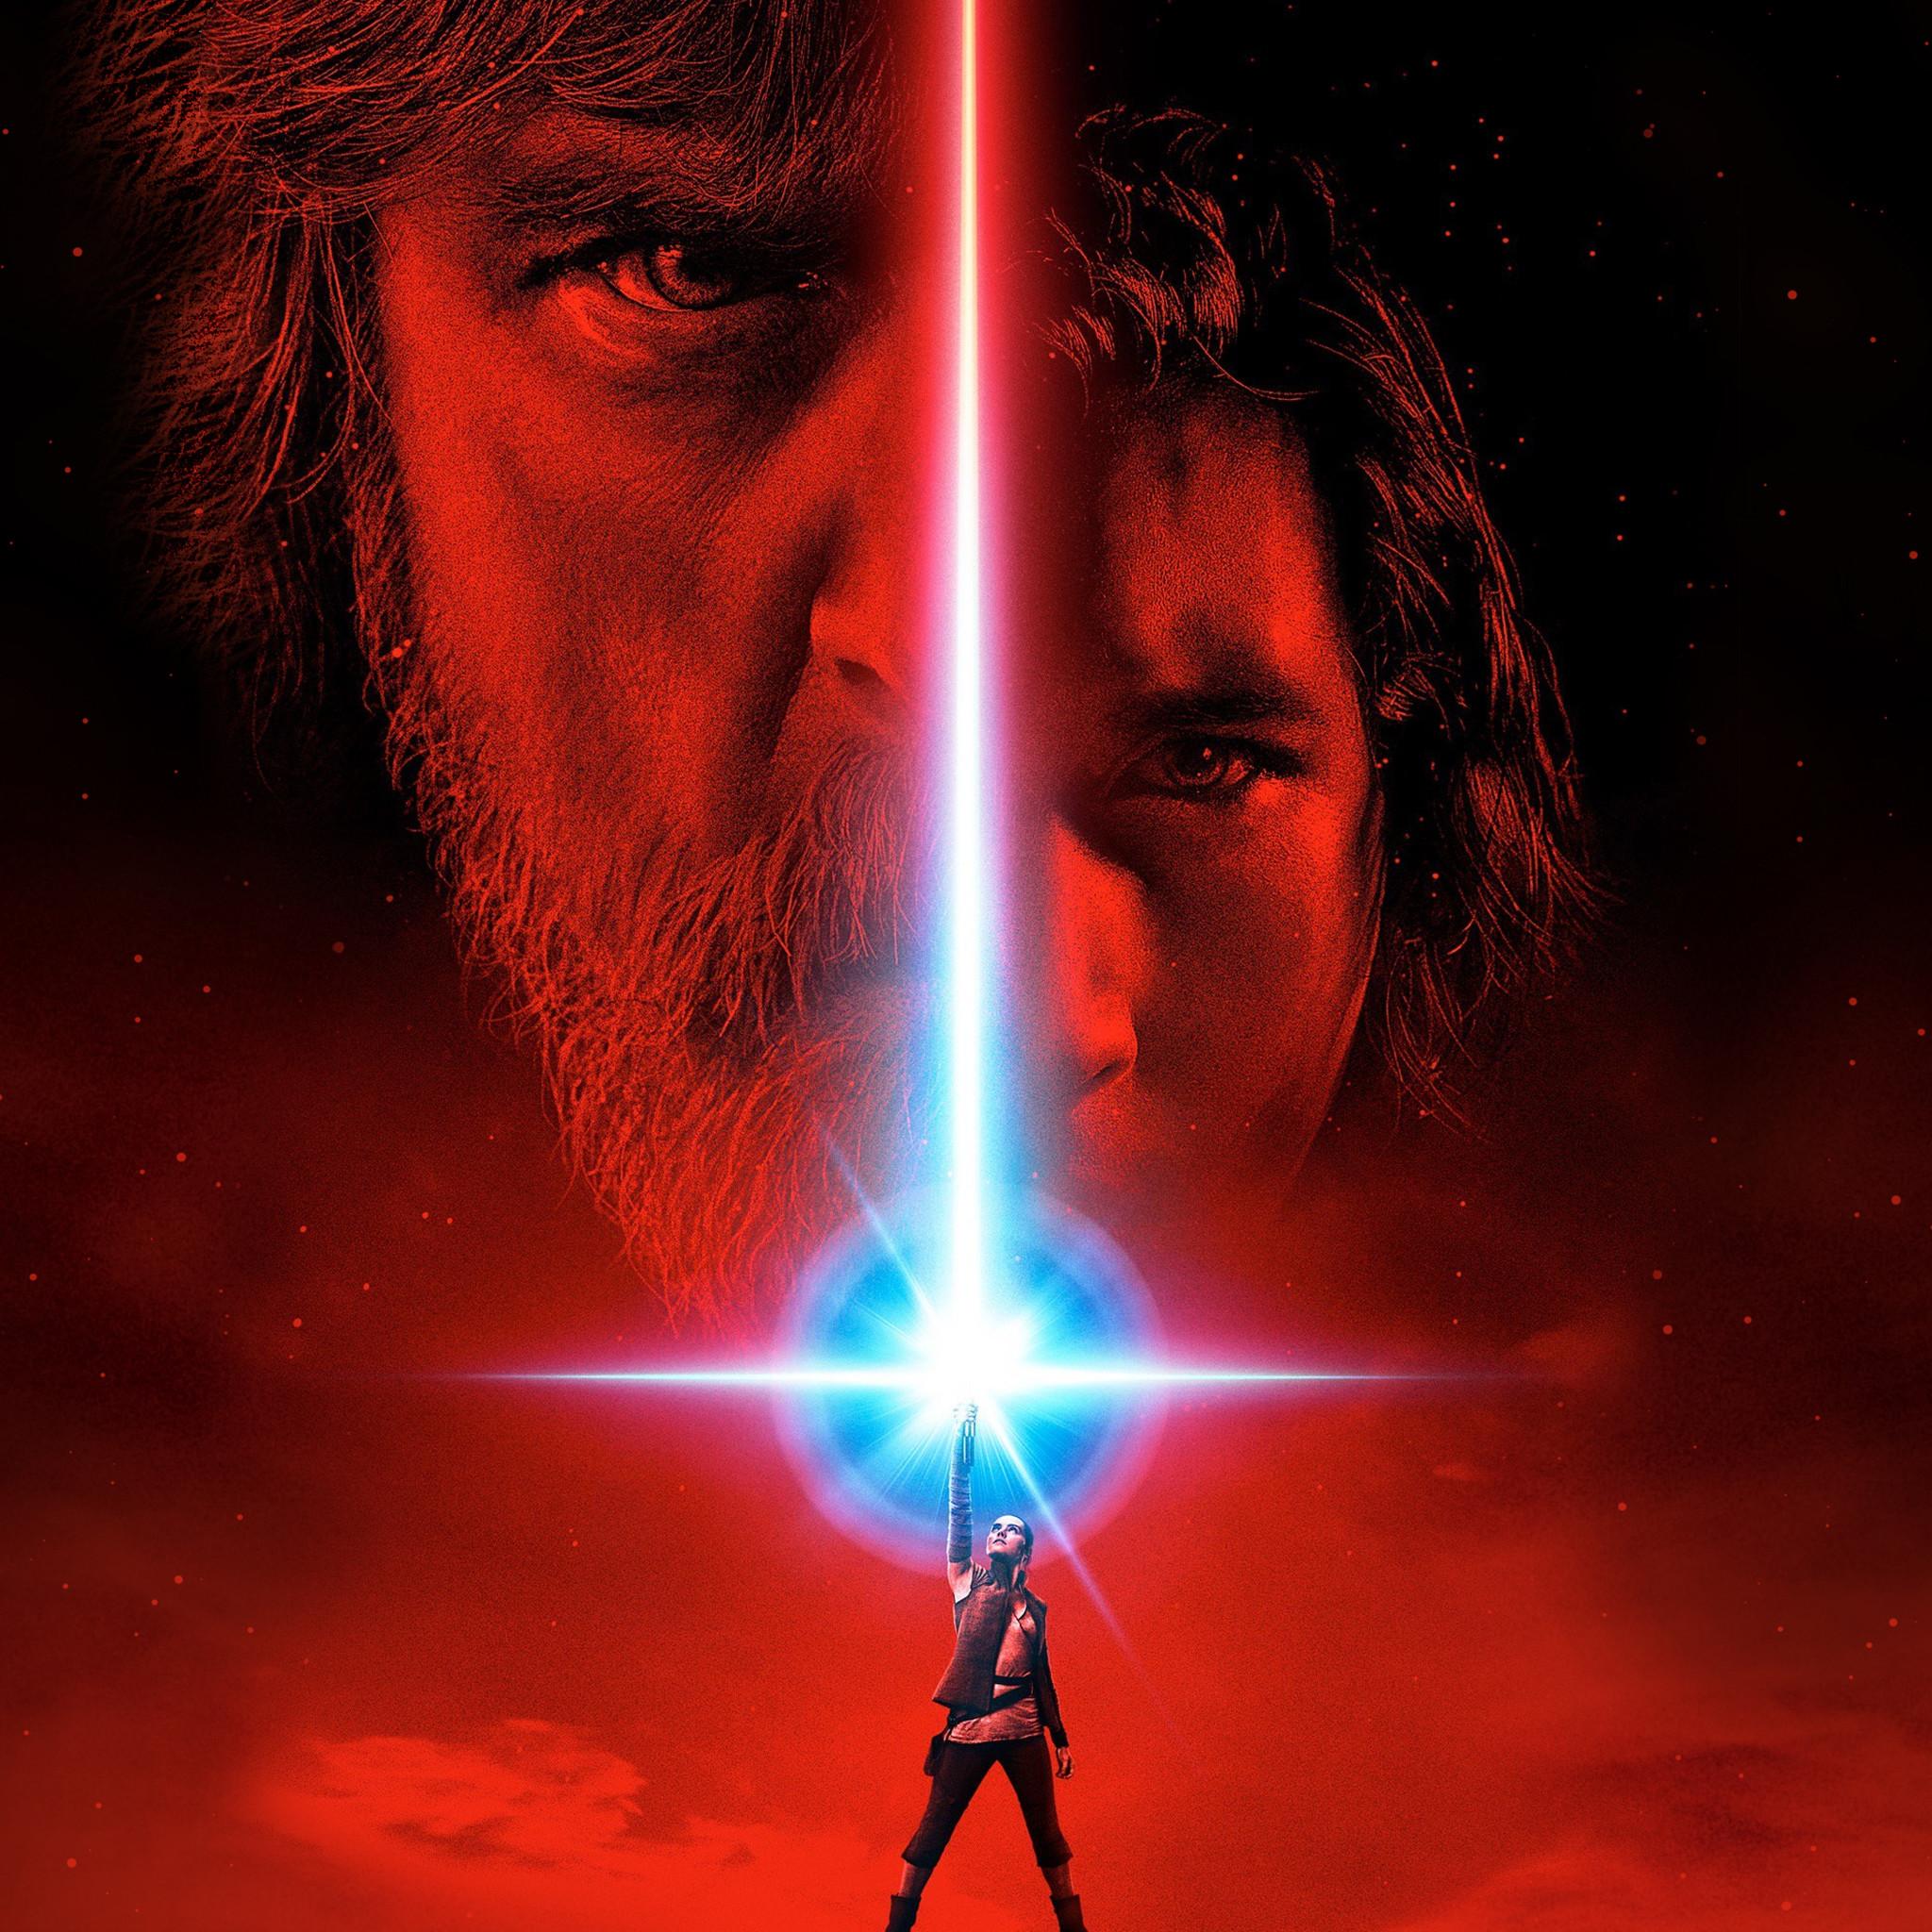 star-wars-episode-viii-the-last-jedi-4k-